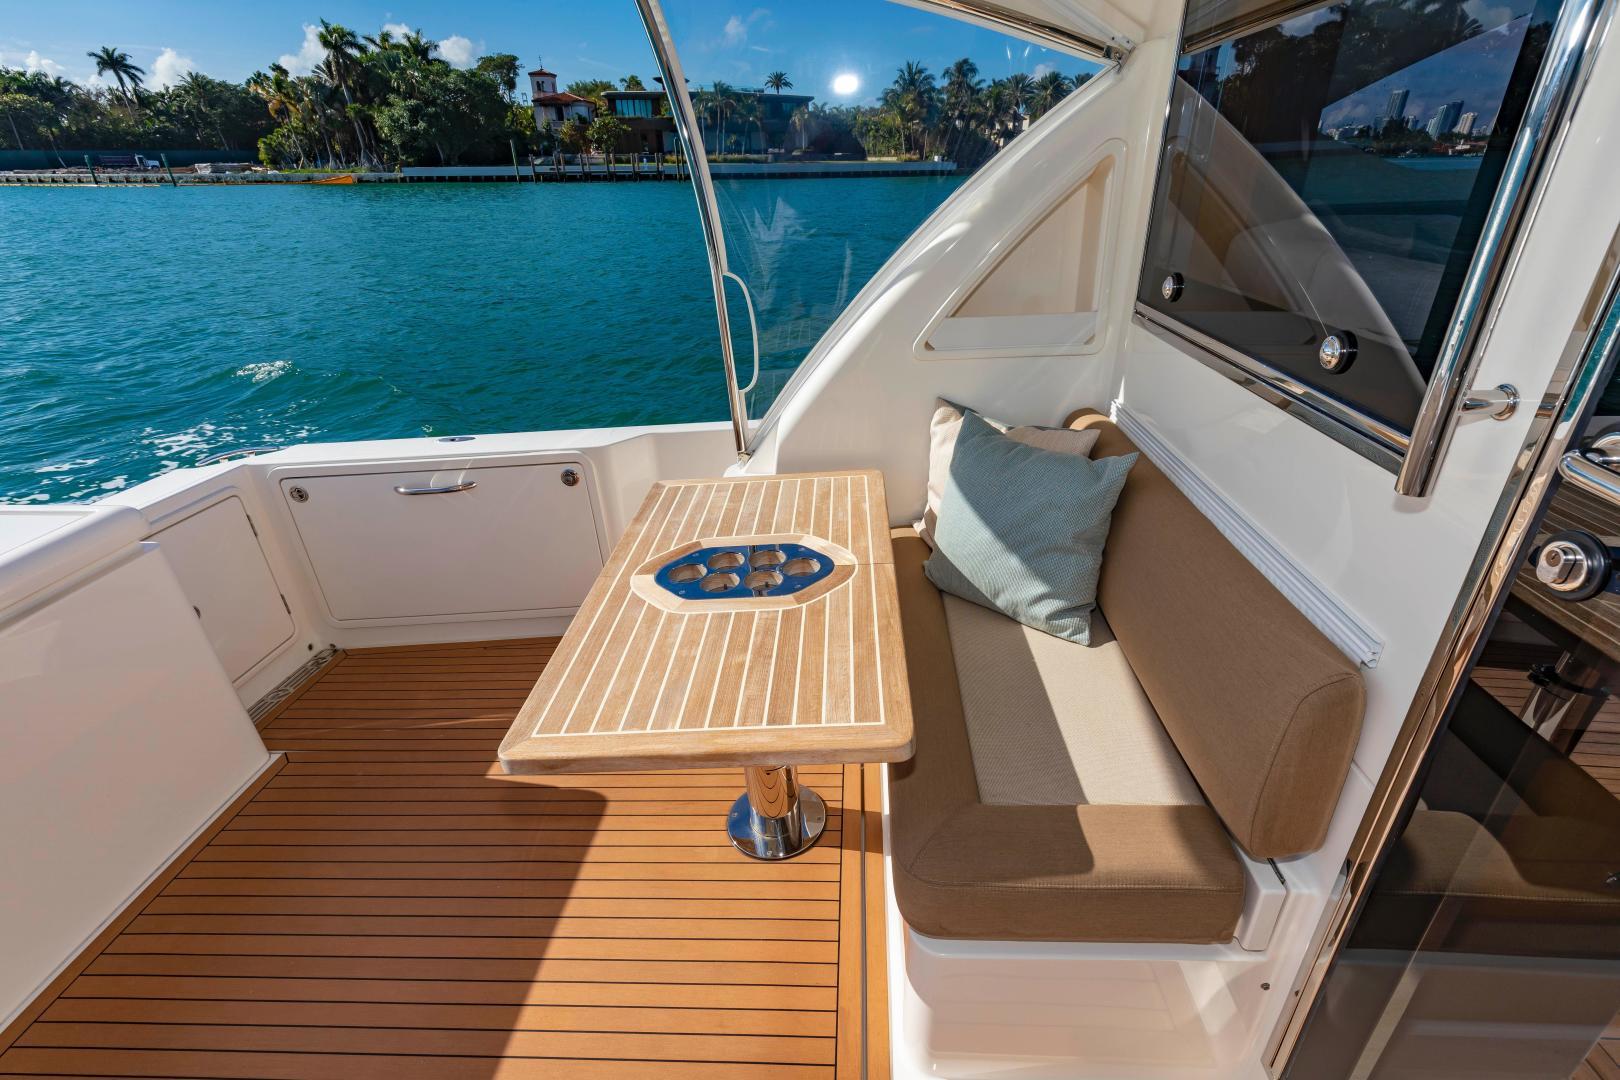 Riviera-395 SUV 2019-Ipanema Miami Beach-Florida-United States-1614887   Thumbnail